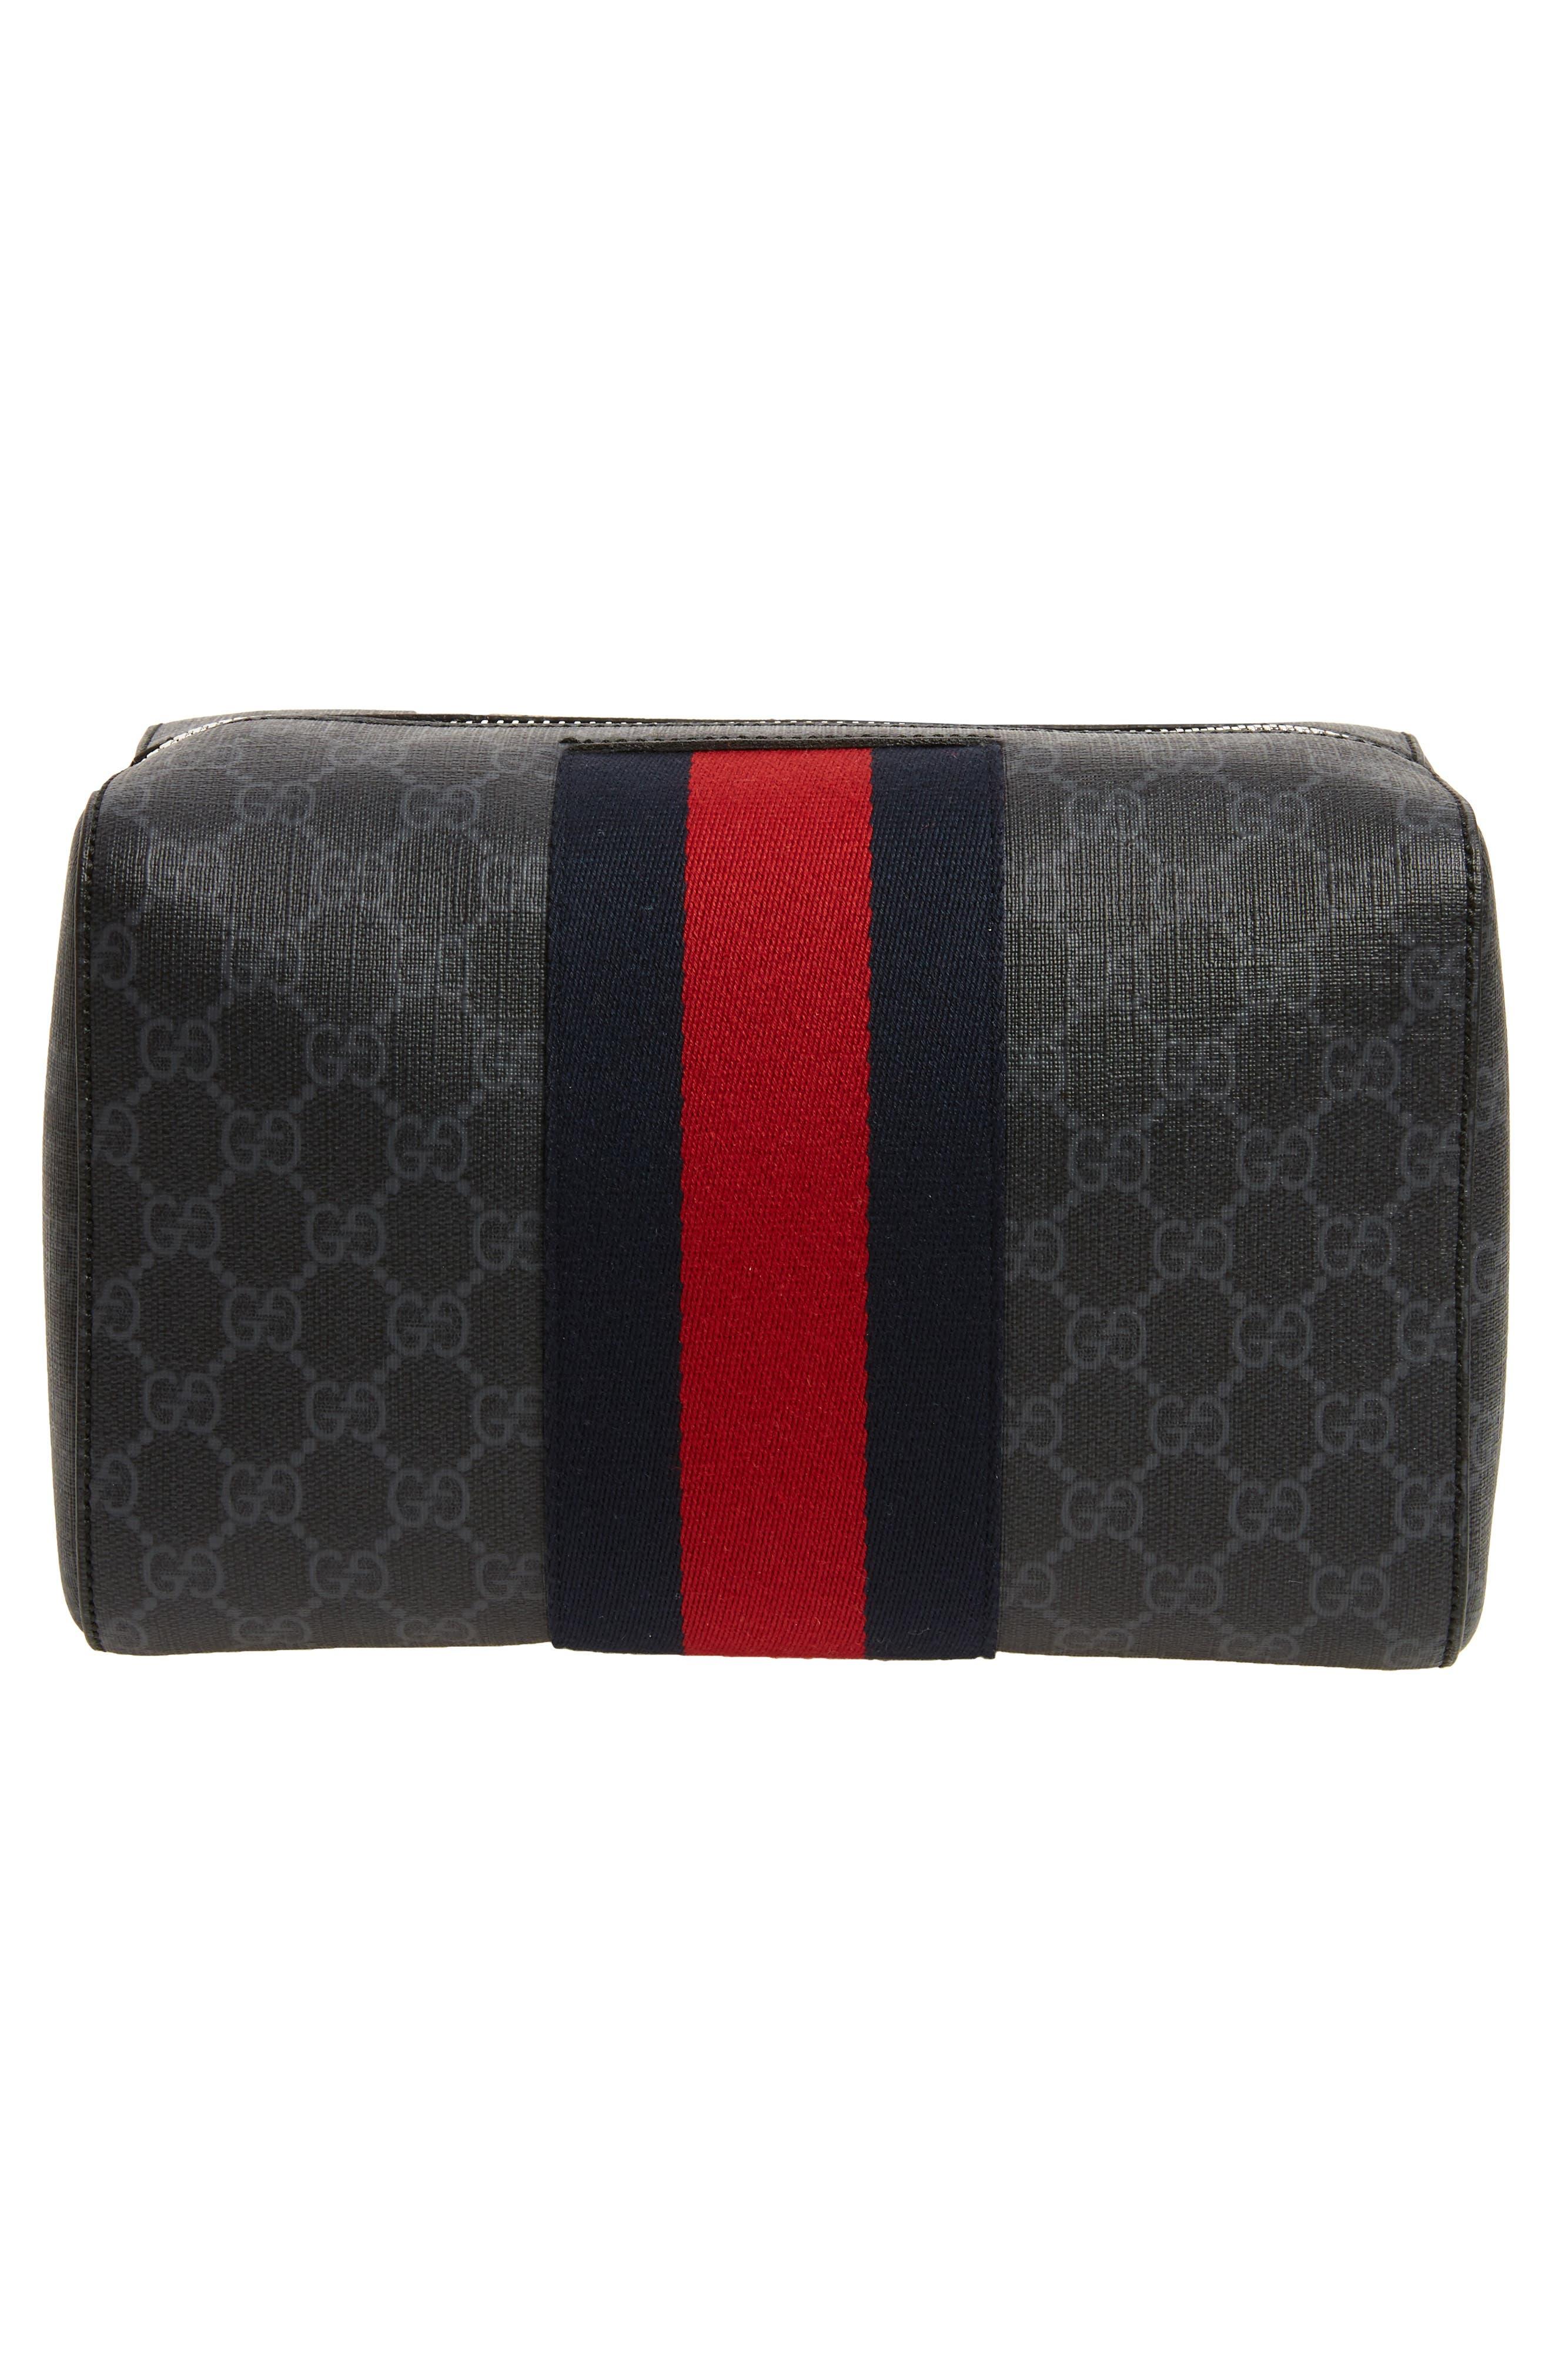 GG Supreme Hand Duffel Bag,                             Alternate thumbnail 2, color,                             001